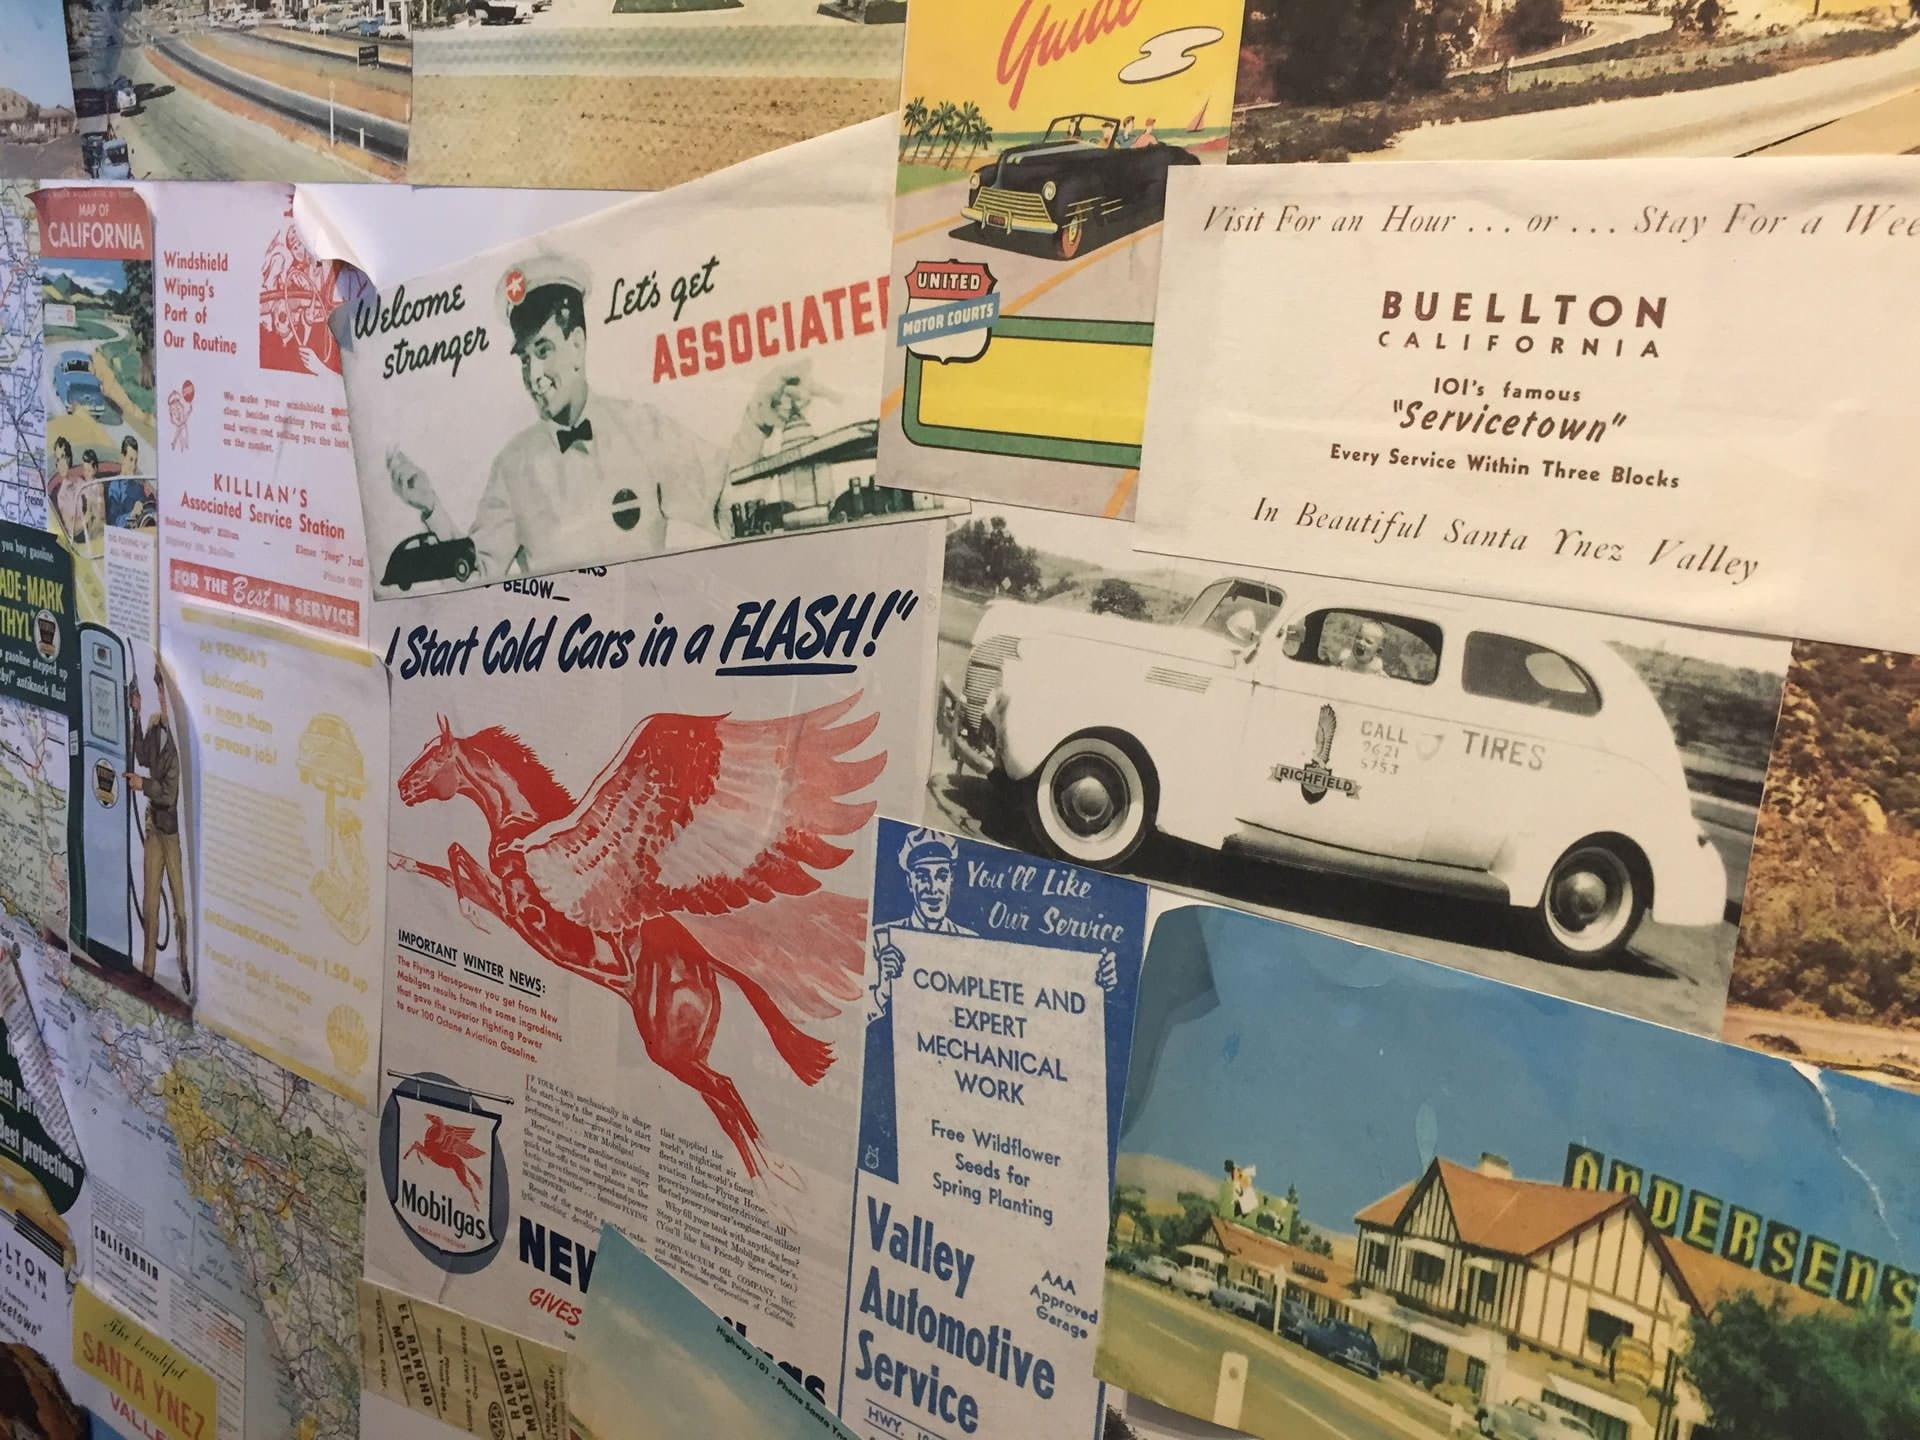 Buellton Historical Society